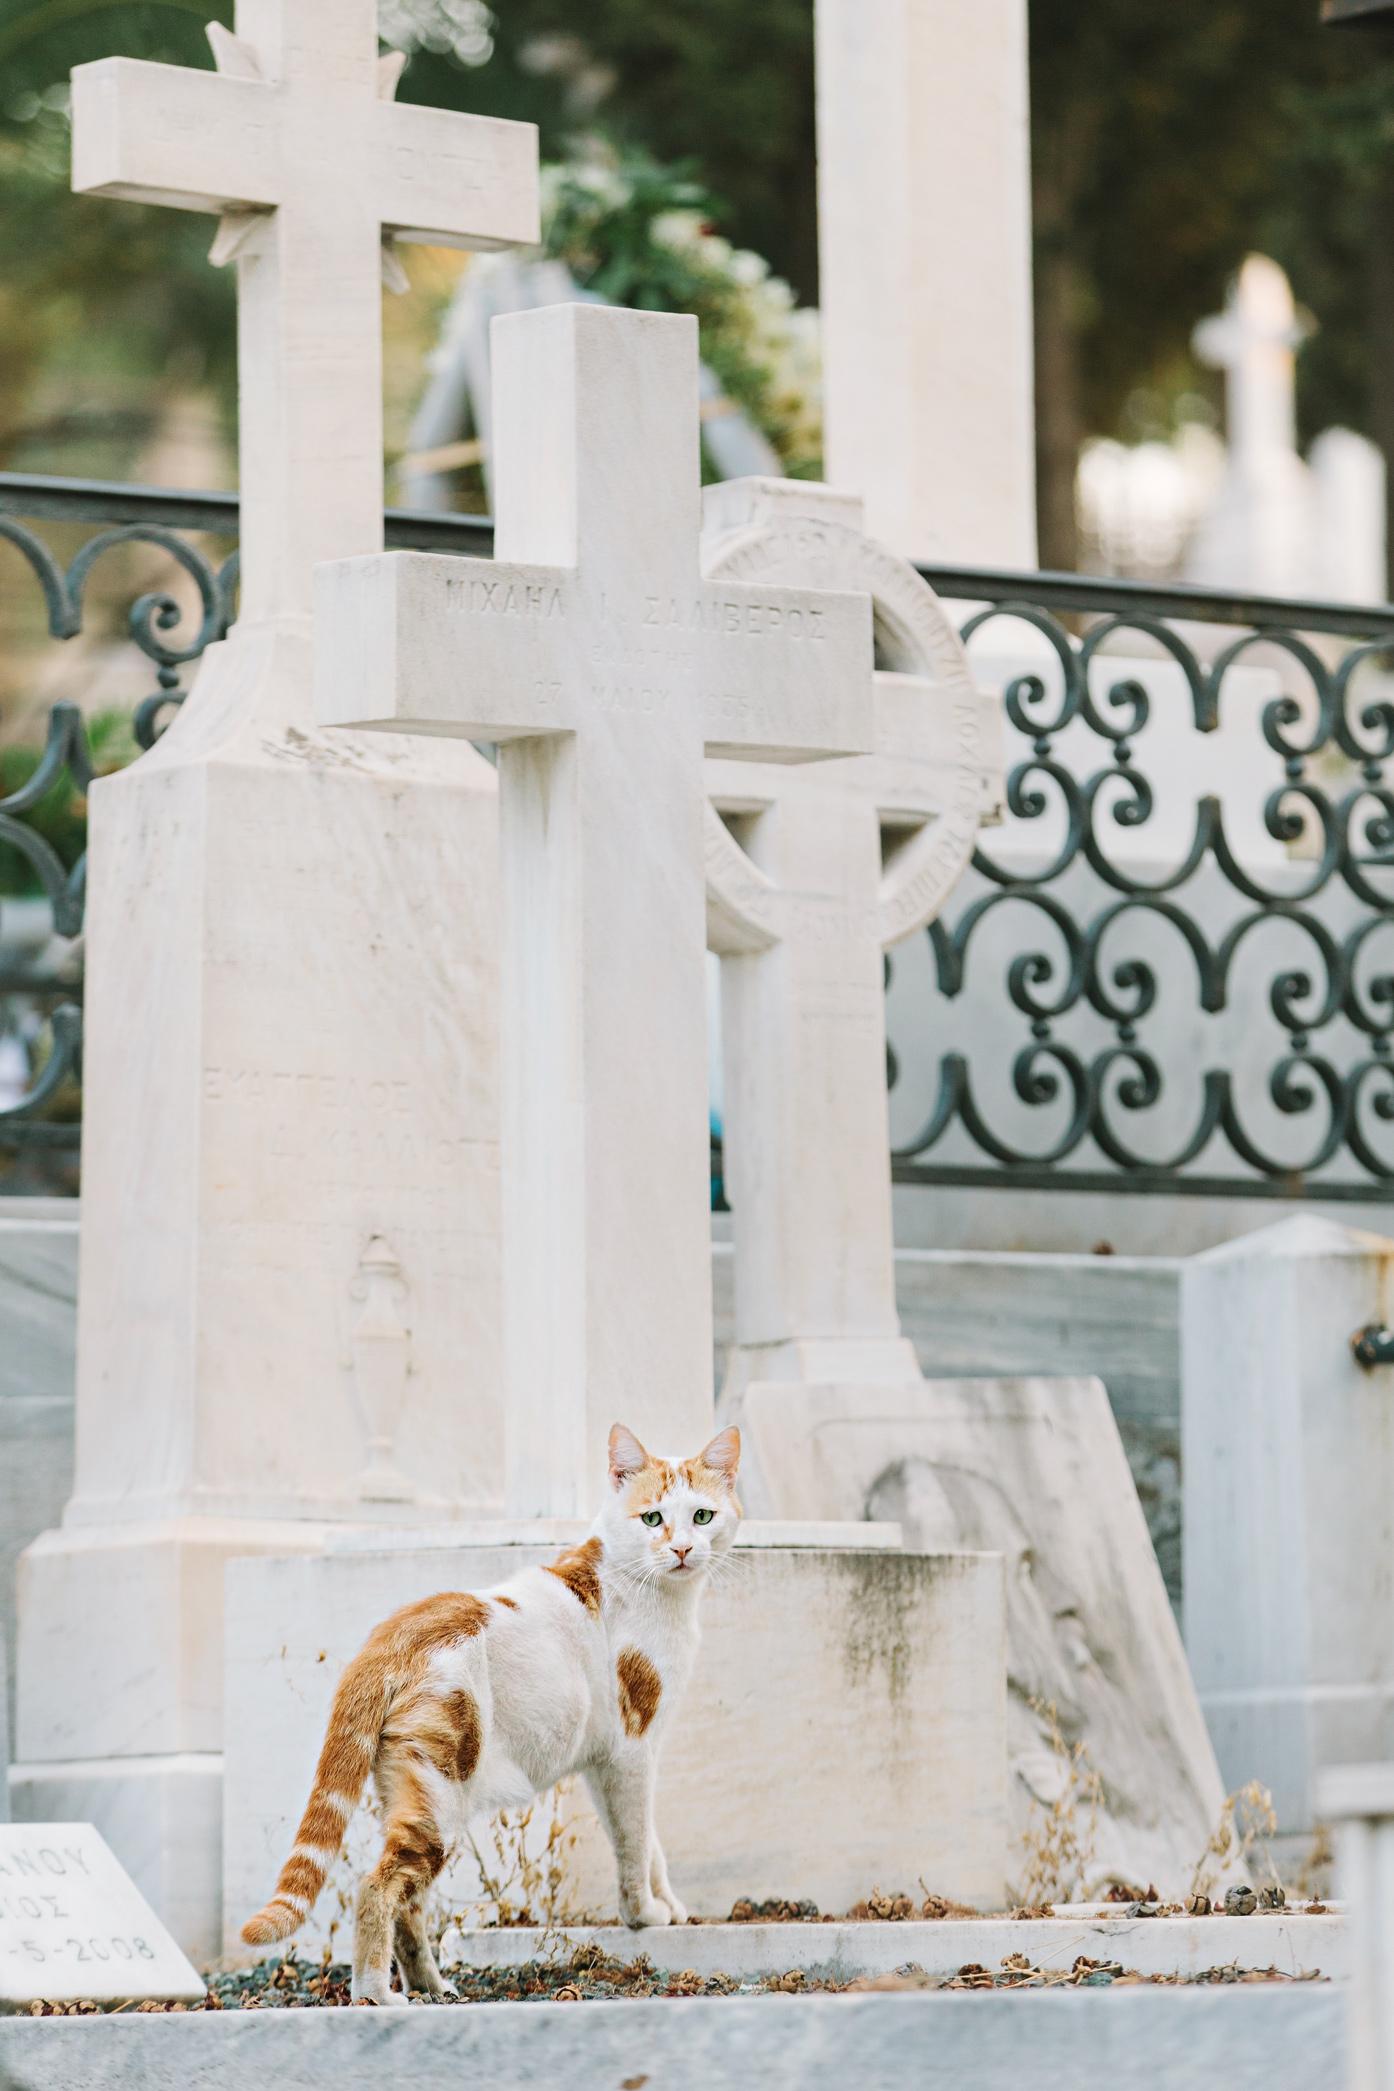 CindyGiovagnoli_Athens_Greece_travel_photographer-110.jpg